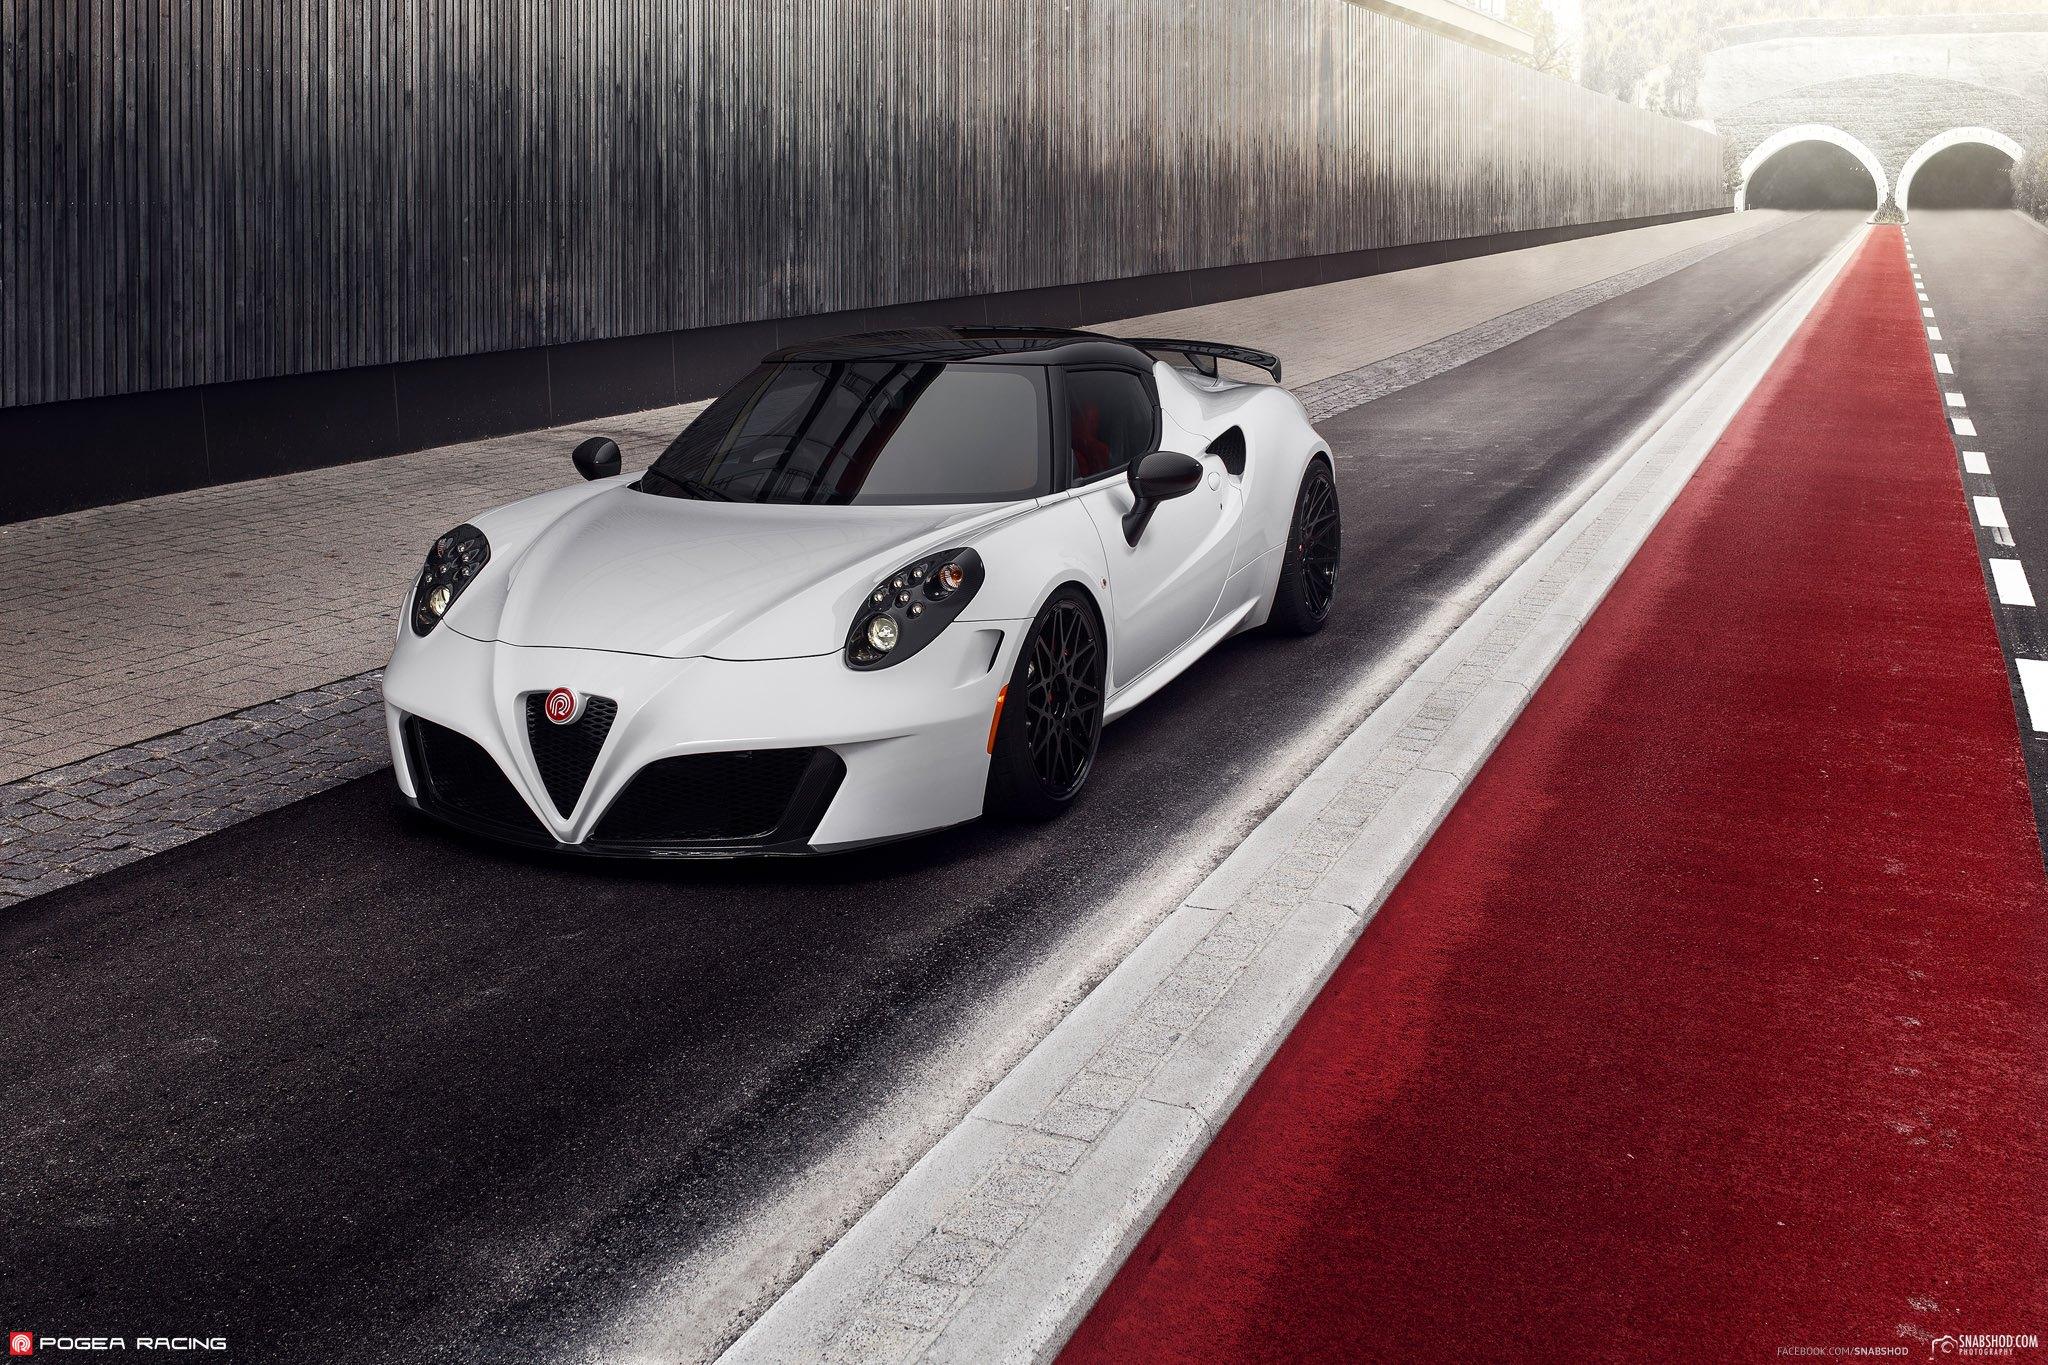 alfa romeo 4c tuned by pogea racing italian beauty meets. Black Bedroom Furniture Sets. Home Design Ideas